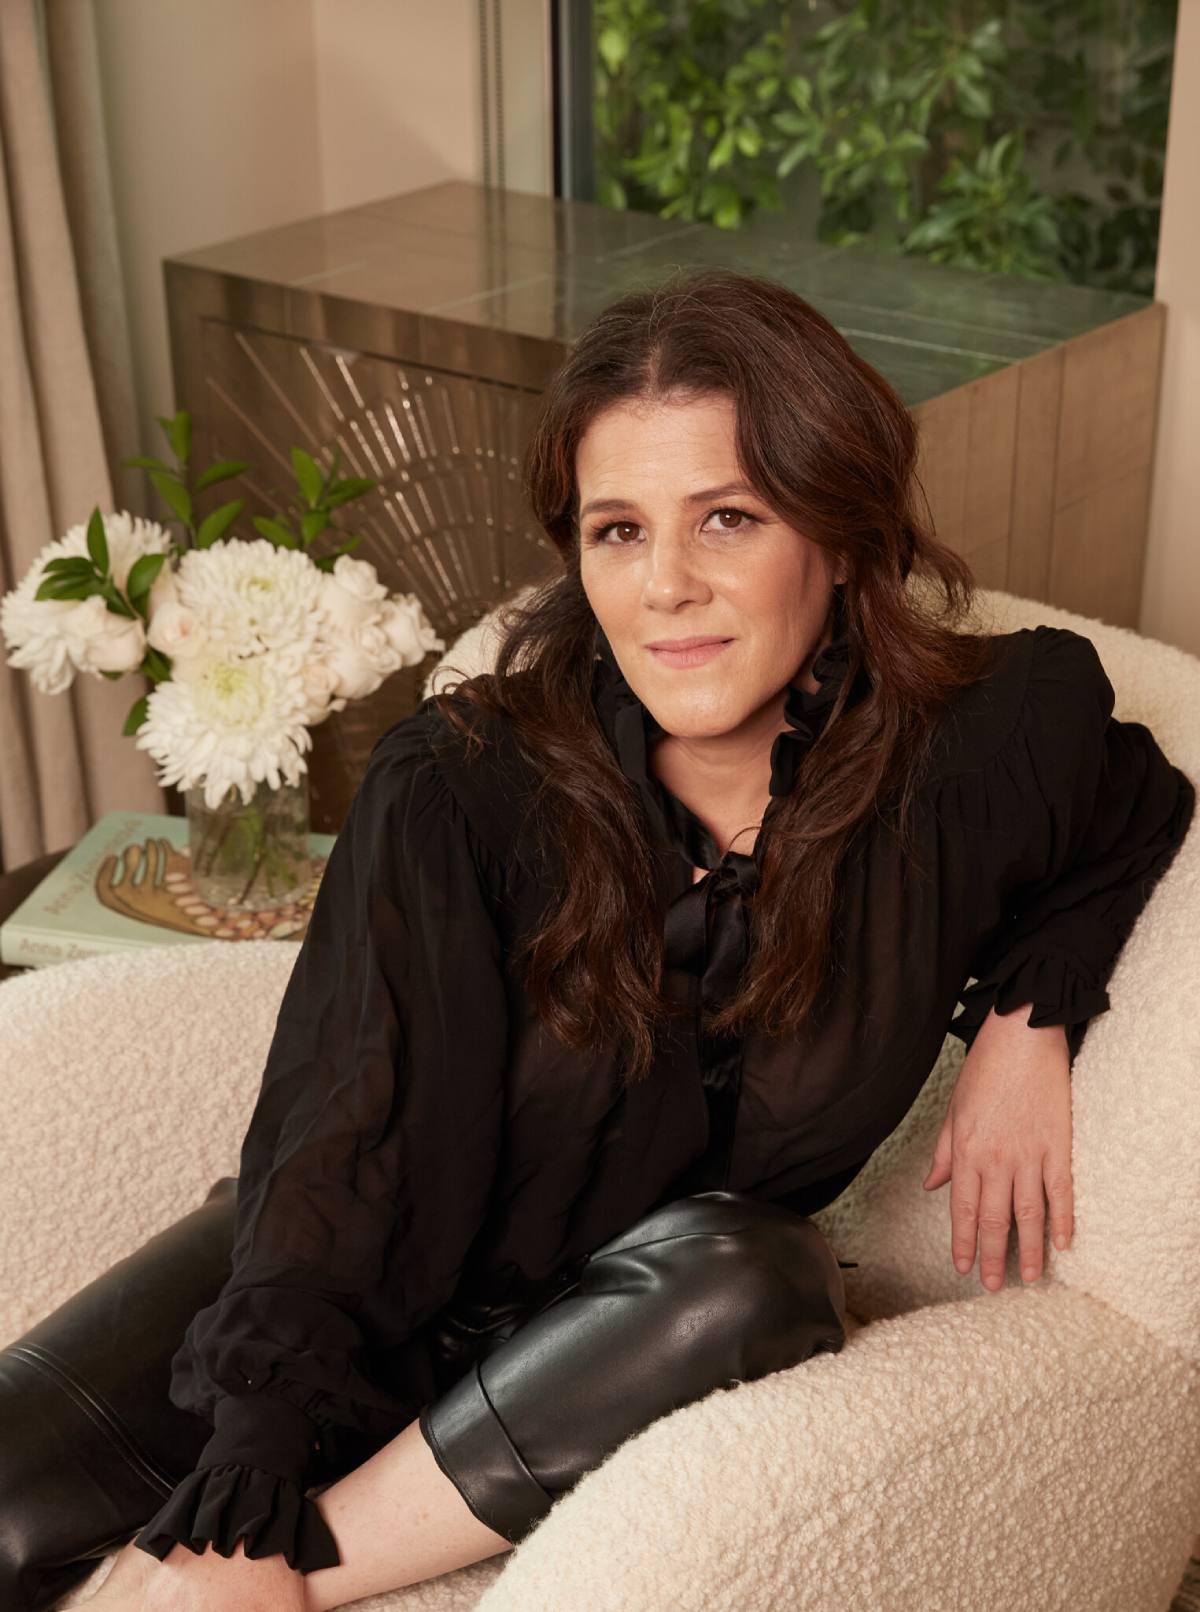 Career Advice from Celeb Stylist Tracey Cunningham